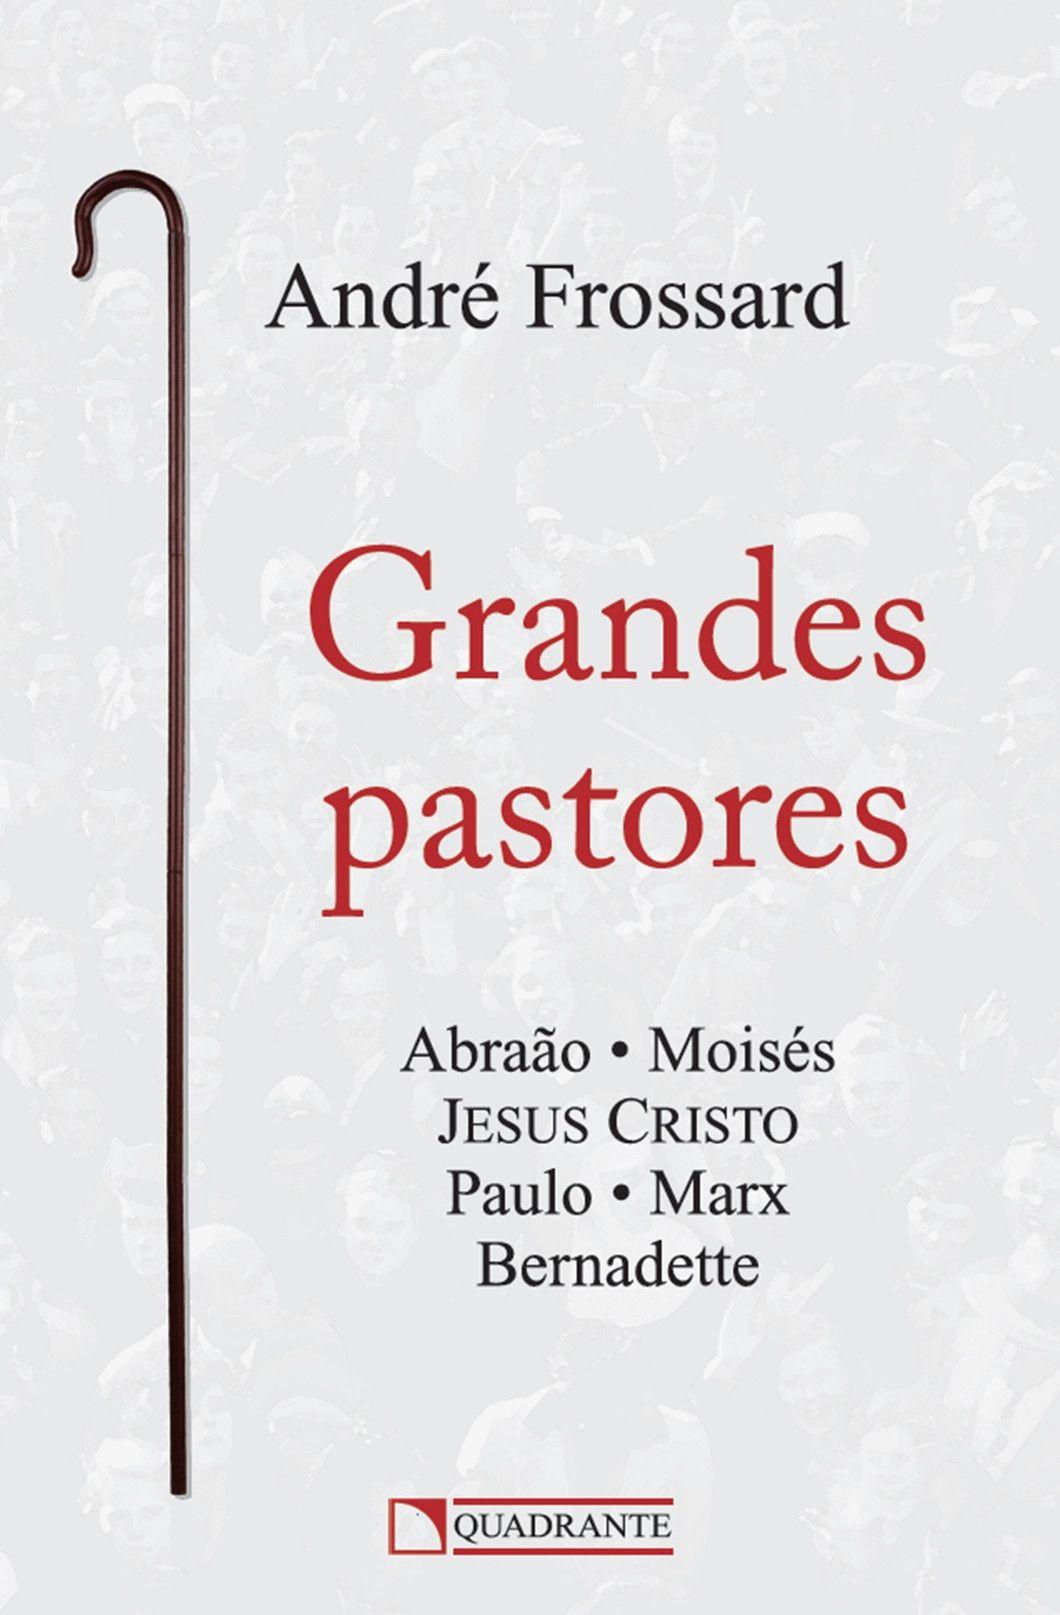 Livro Grandes pastores